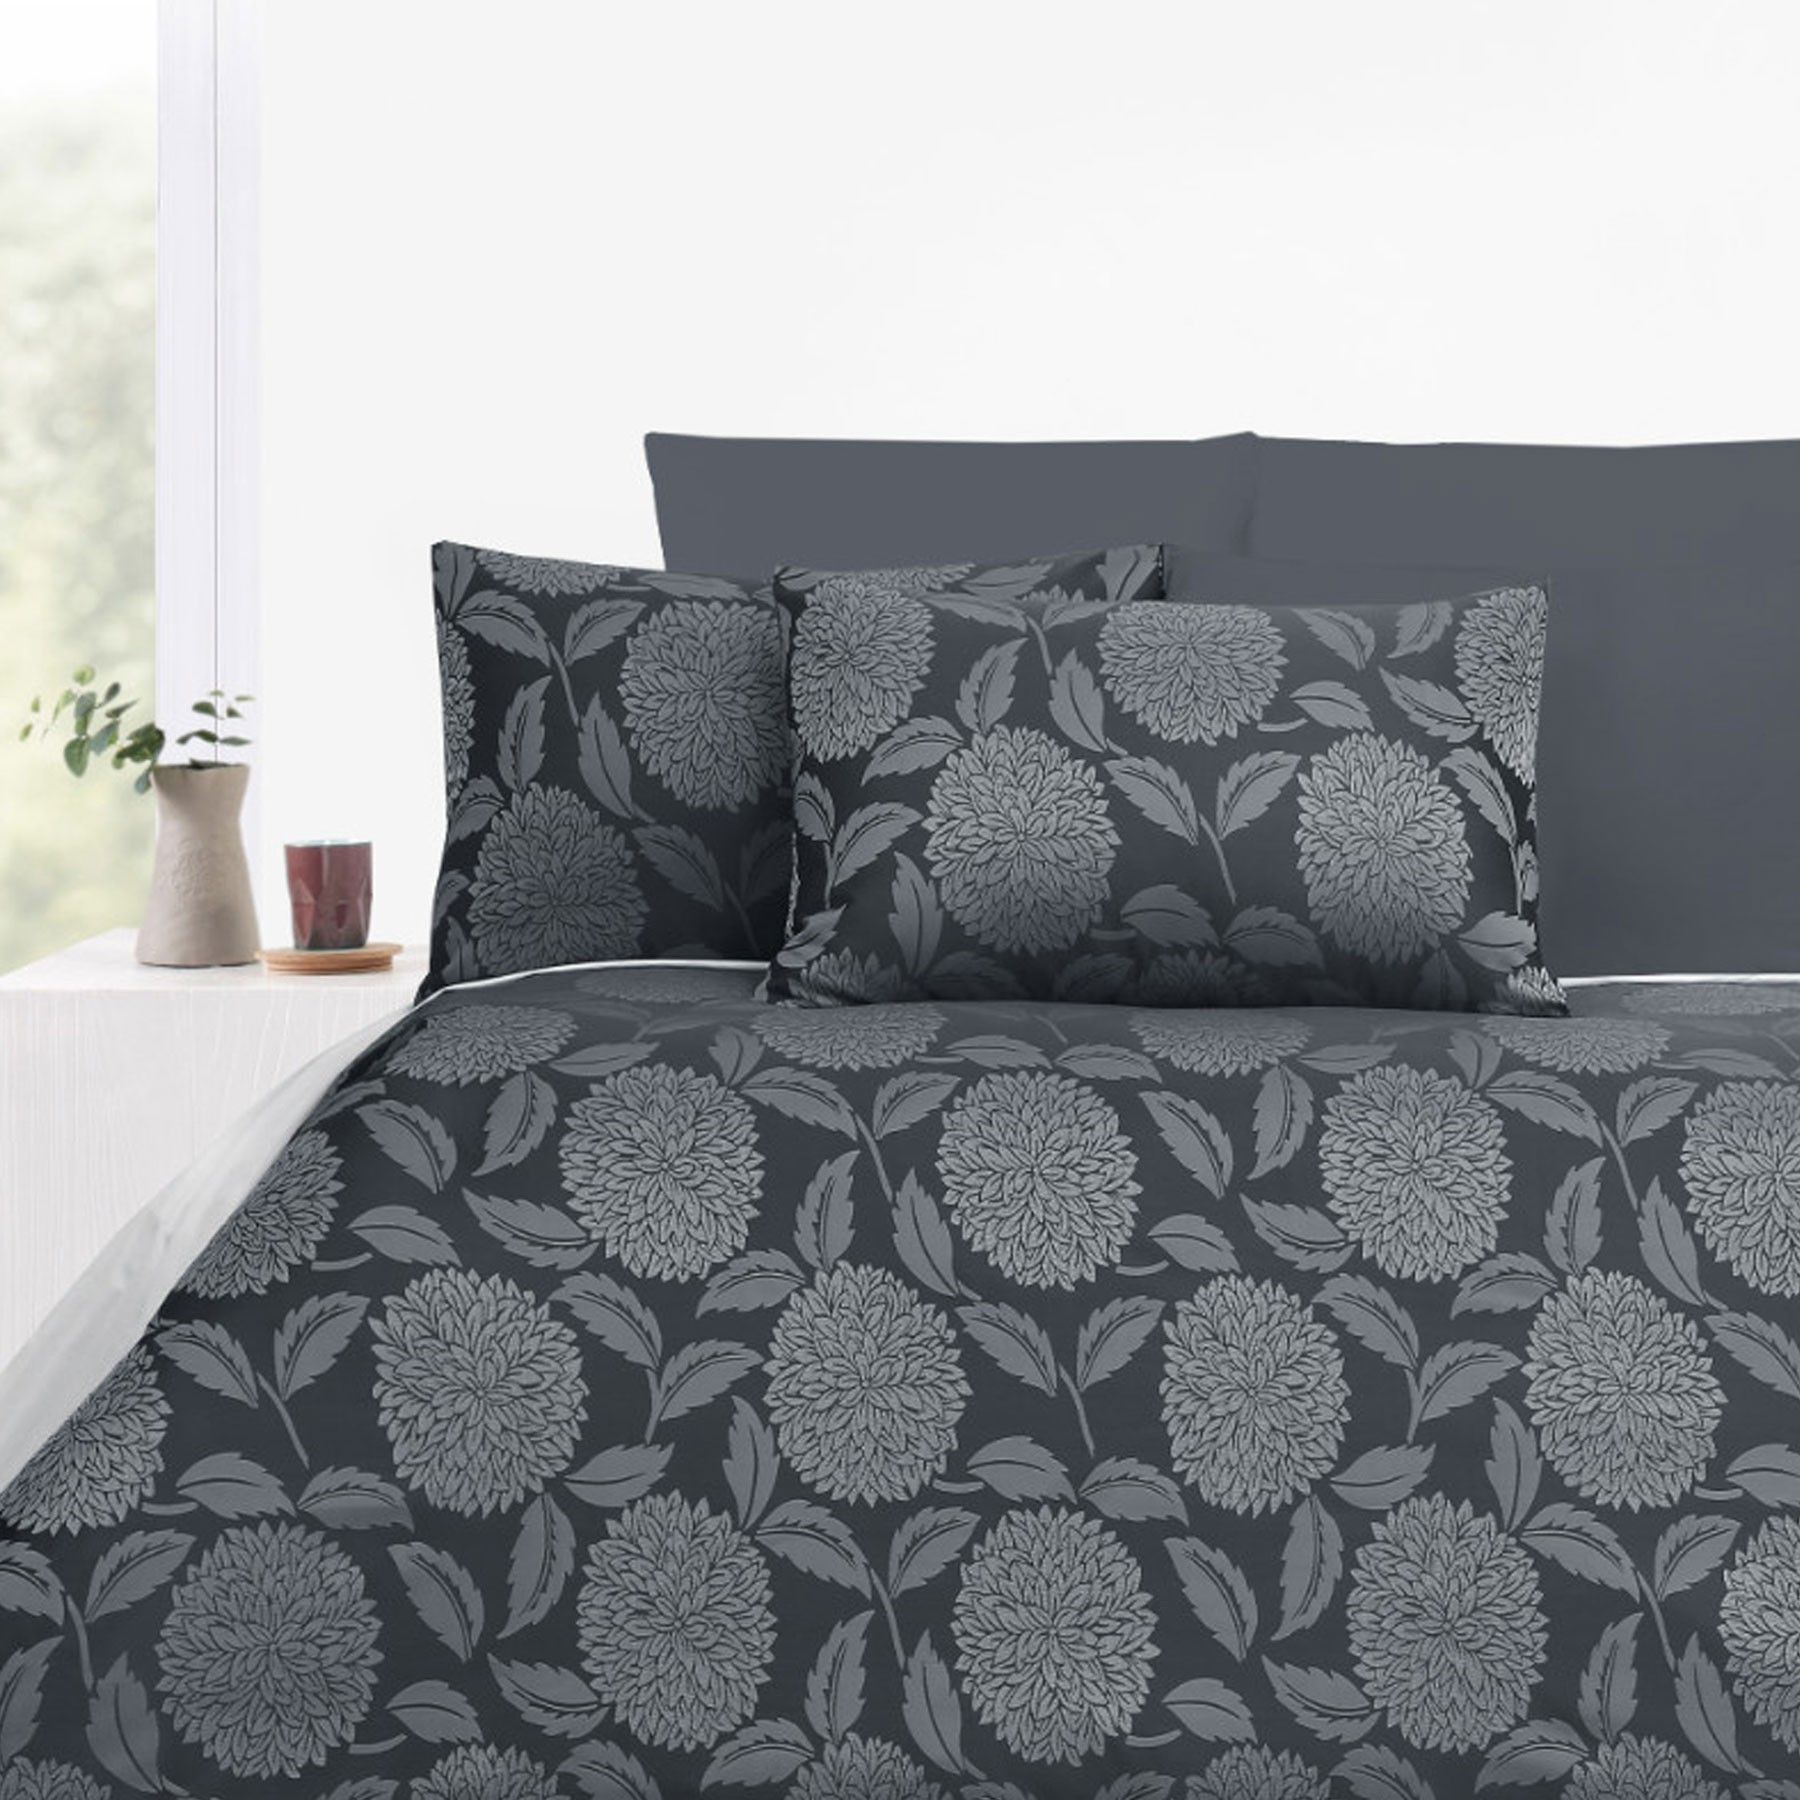 300TC Armure Grey Jacquard Quilt Cover Set by Accessorize | Quilt ... : jacquard quilt - Adamdwight.com